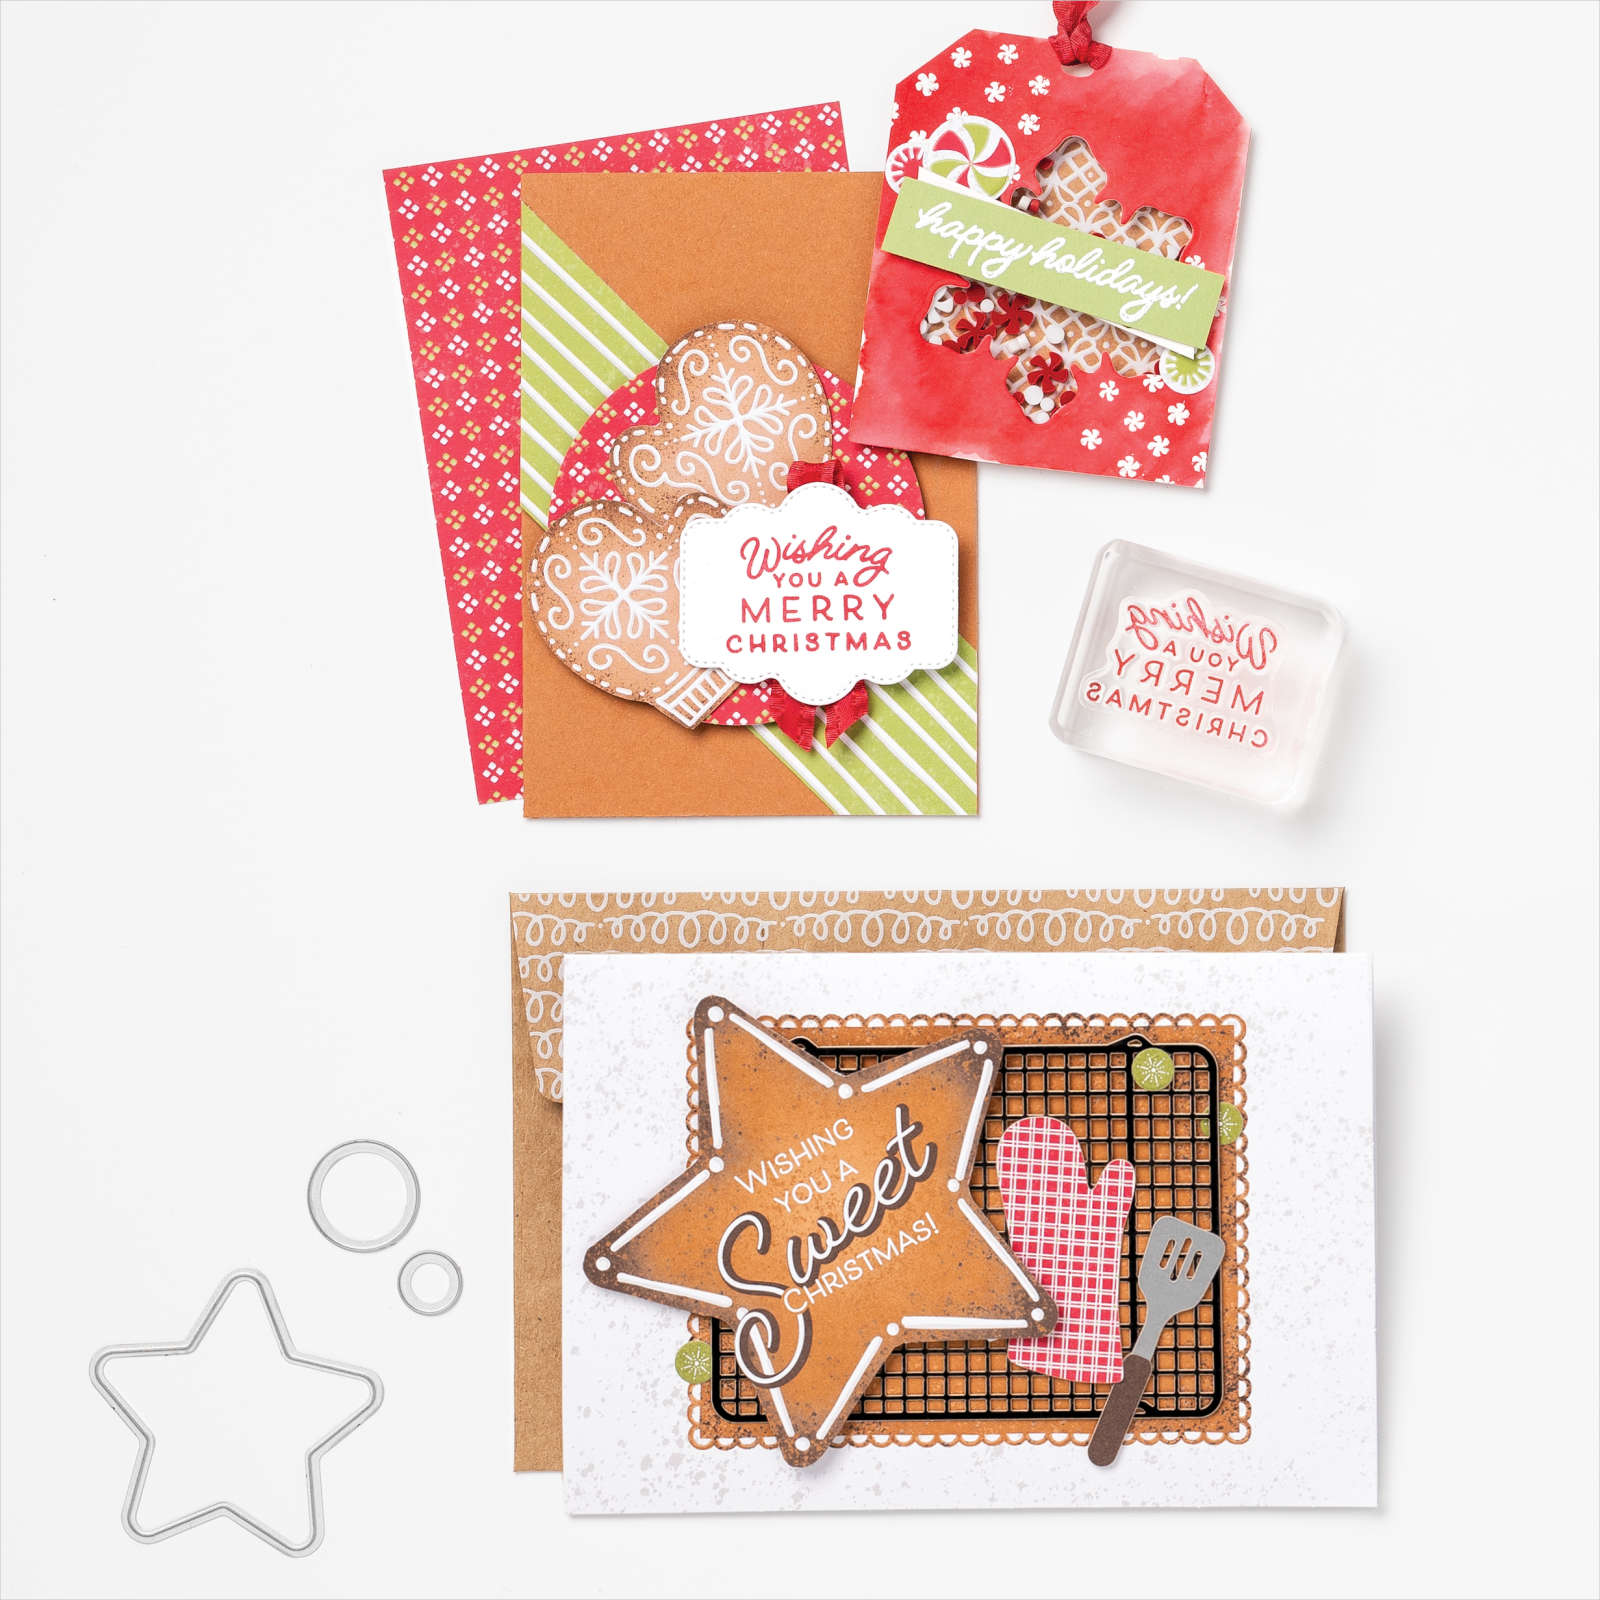 August-December 2021 Mini Catalog - Gingerbread & Peppermint Suite